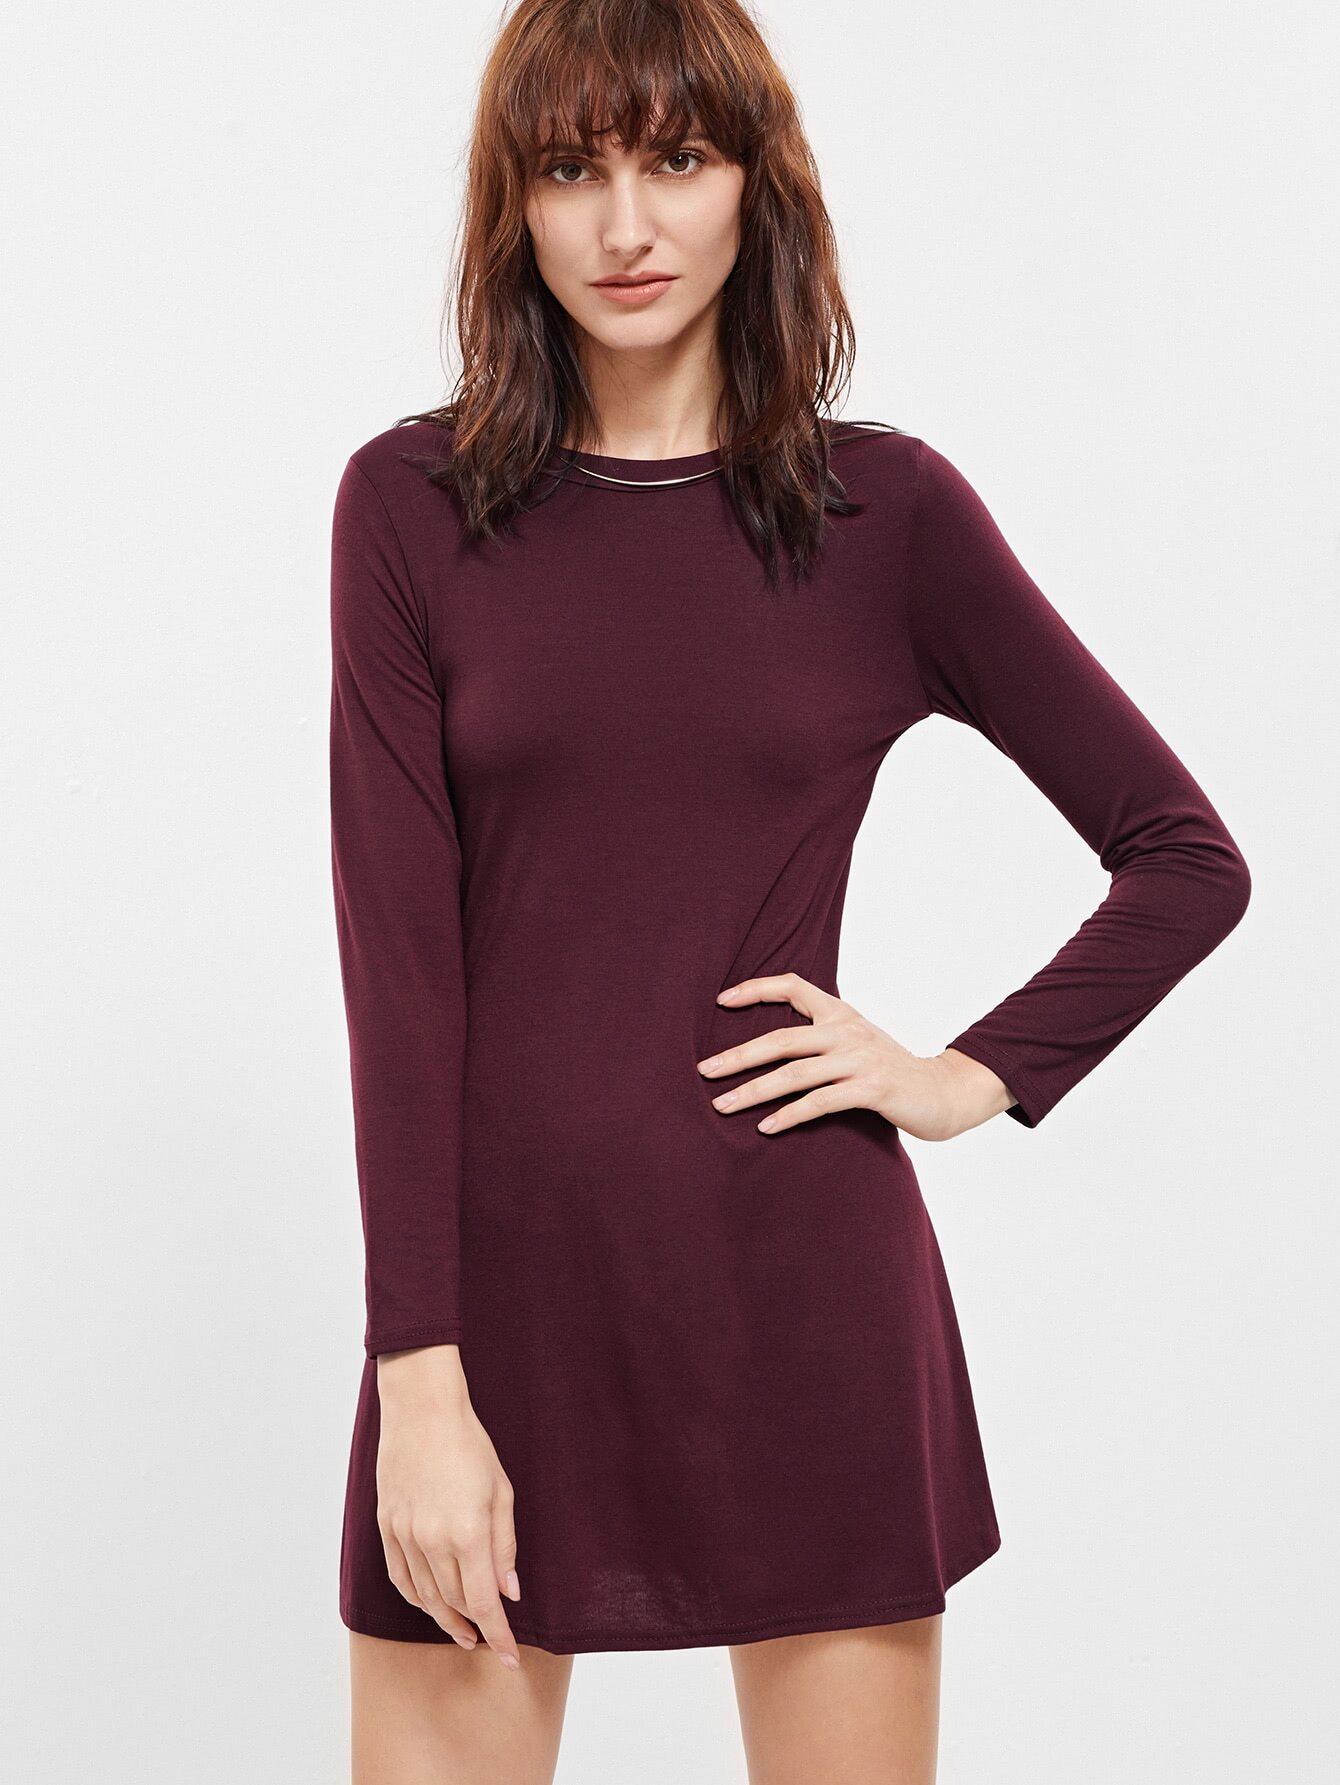 Burgundy Long Sleeve Shift Dress -SheIn(Sheinside)